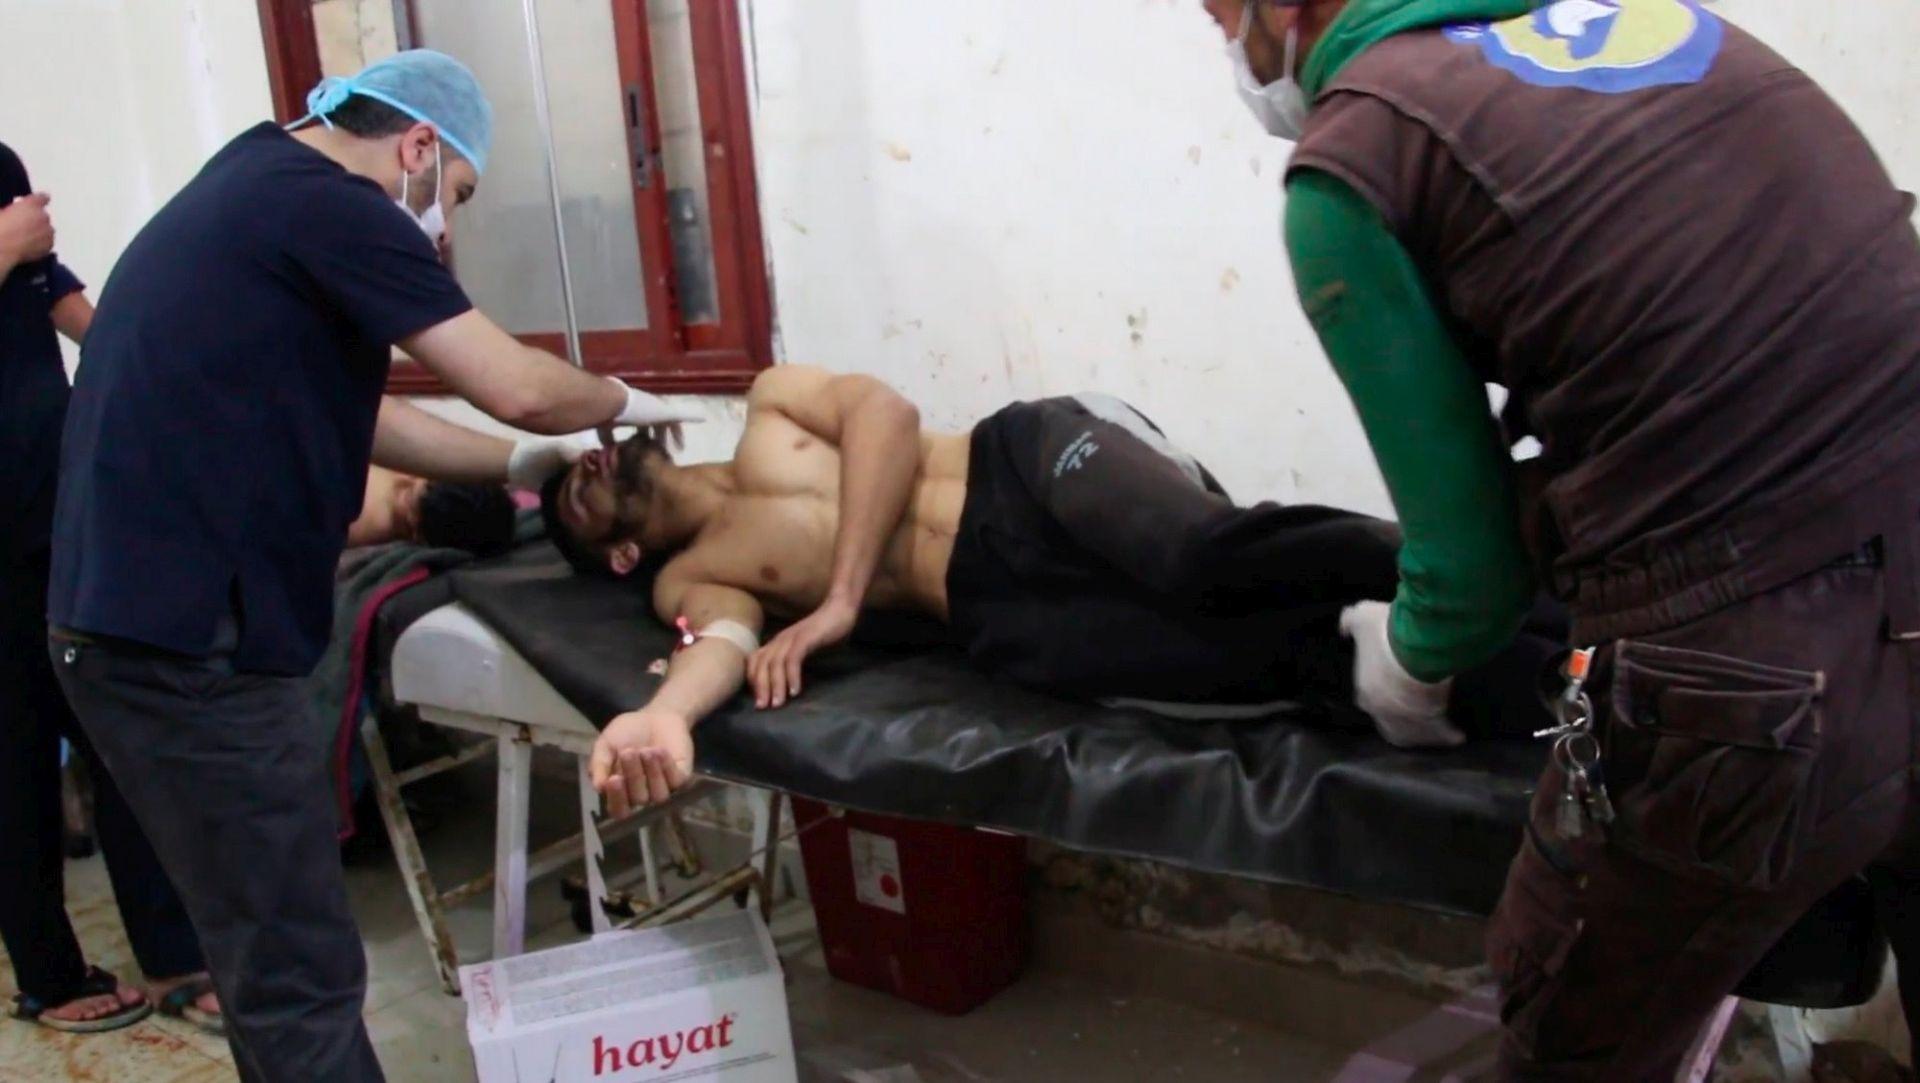 OBDUKCIJA POTVRDILA: U Siriji upotrijebljeno kemijsko oružje